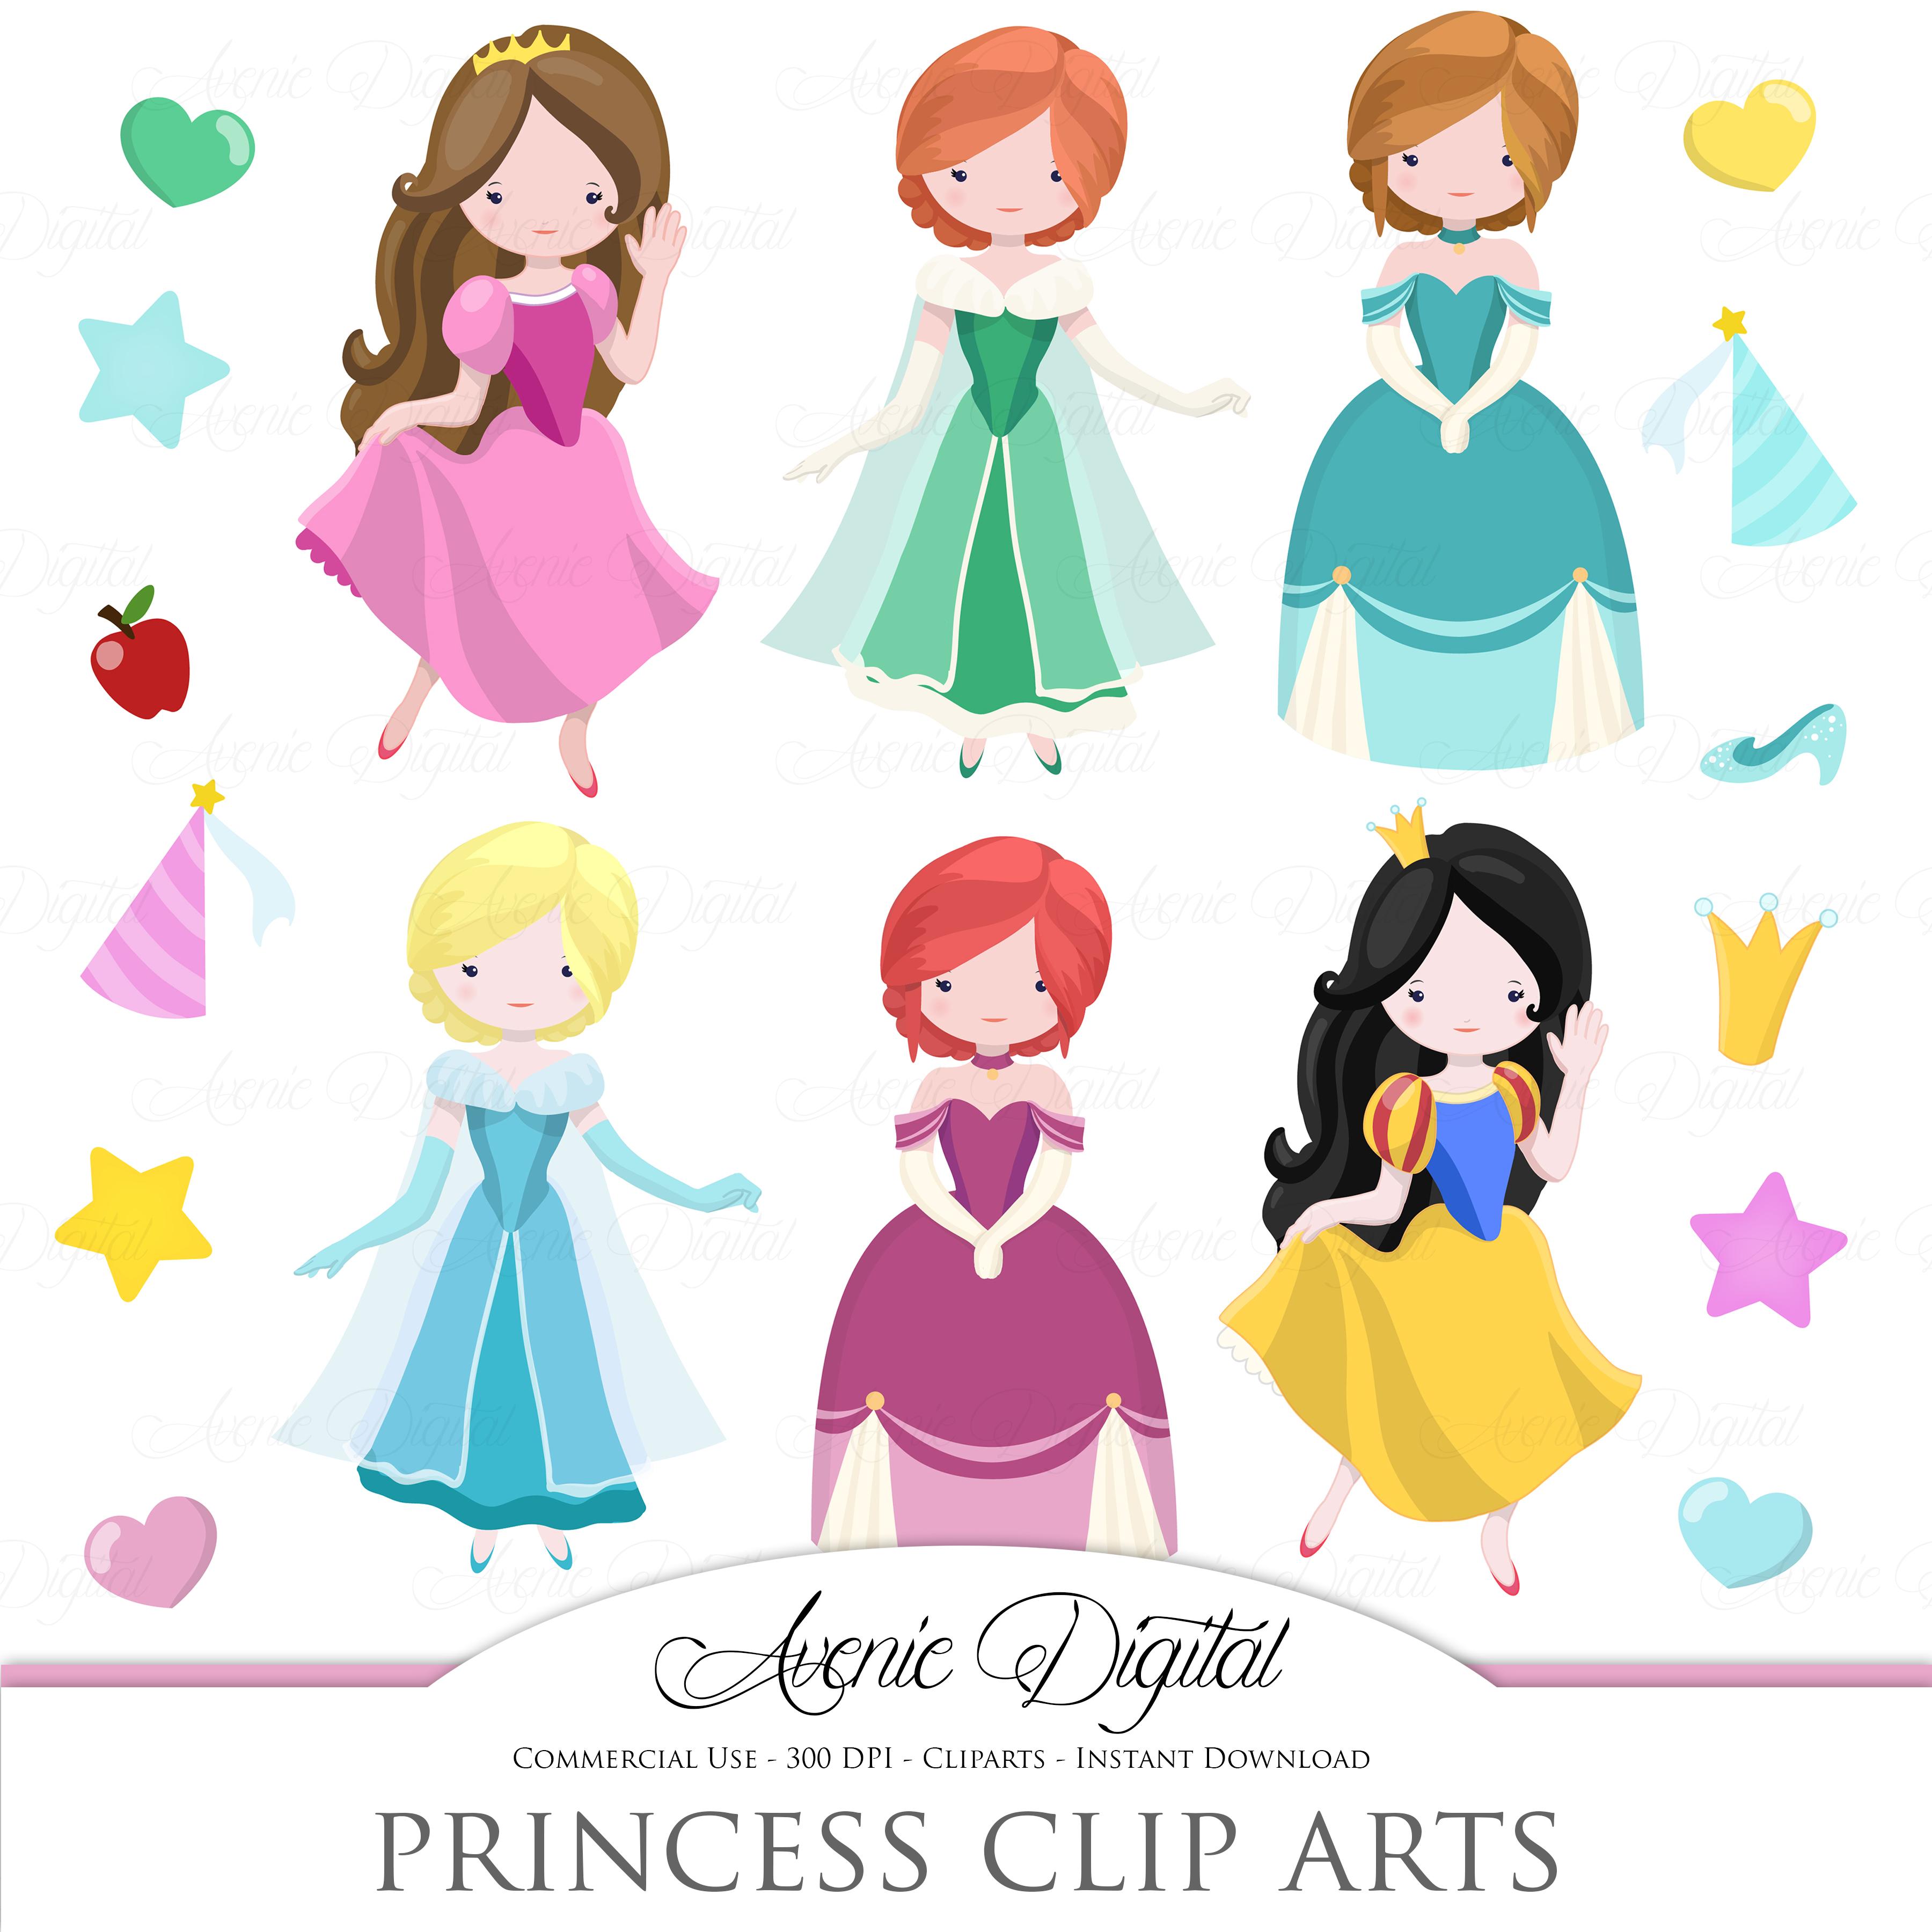 Fairytale Princess Clip Art Vector Illustrations On